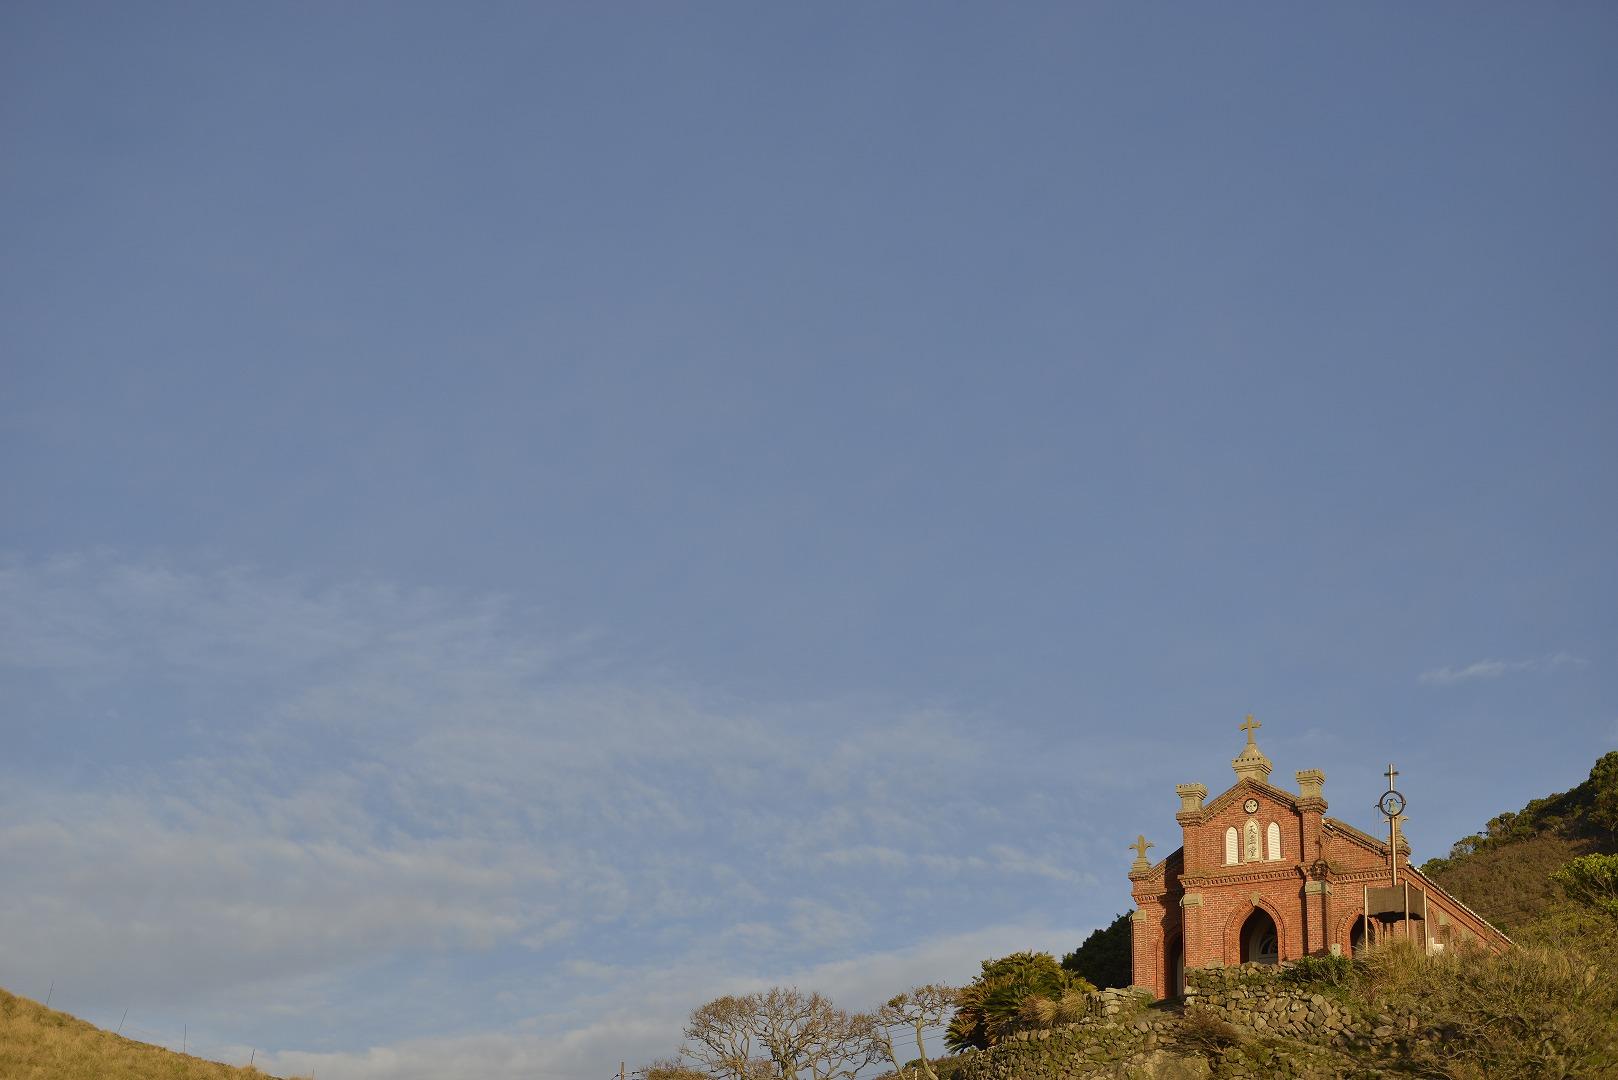 3Dフォトグラファー出水享が撮影した世界遺産候補旧野首教会